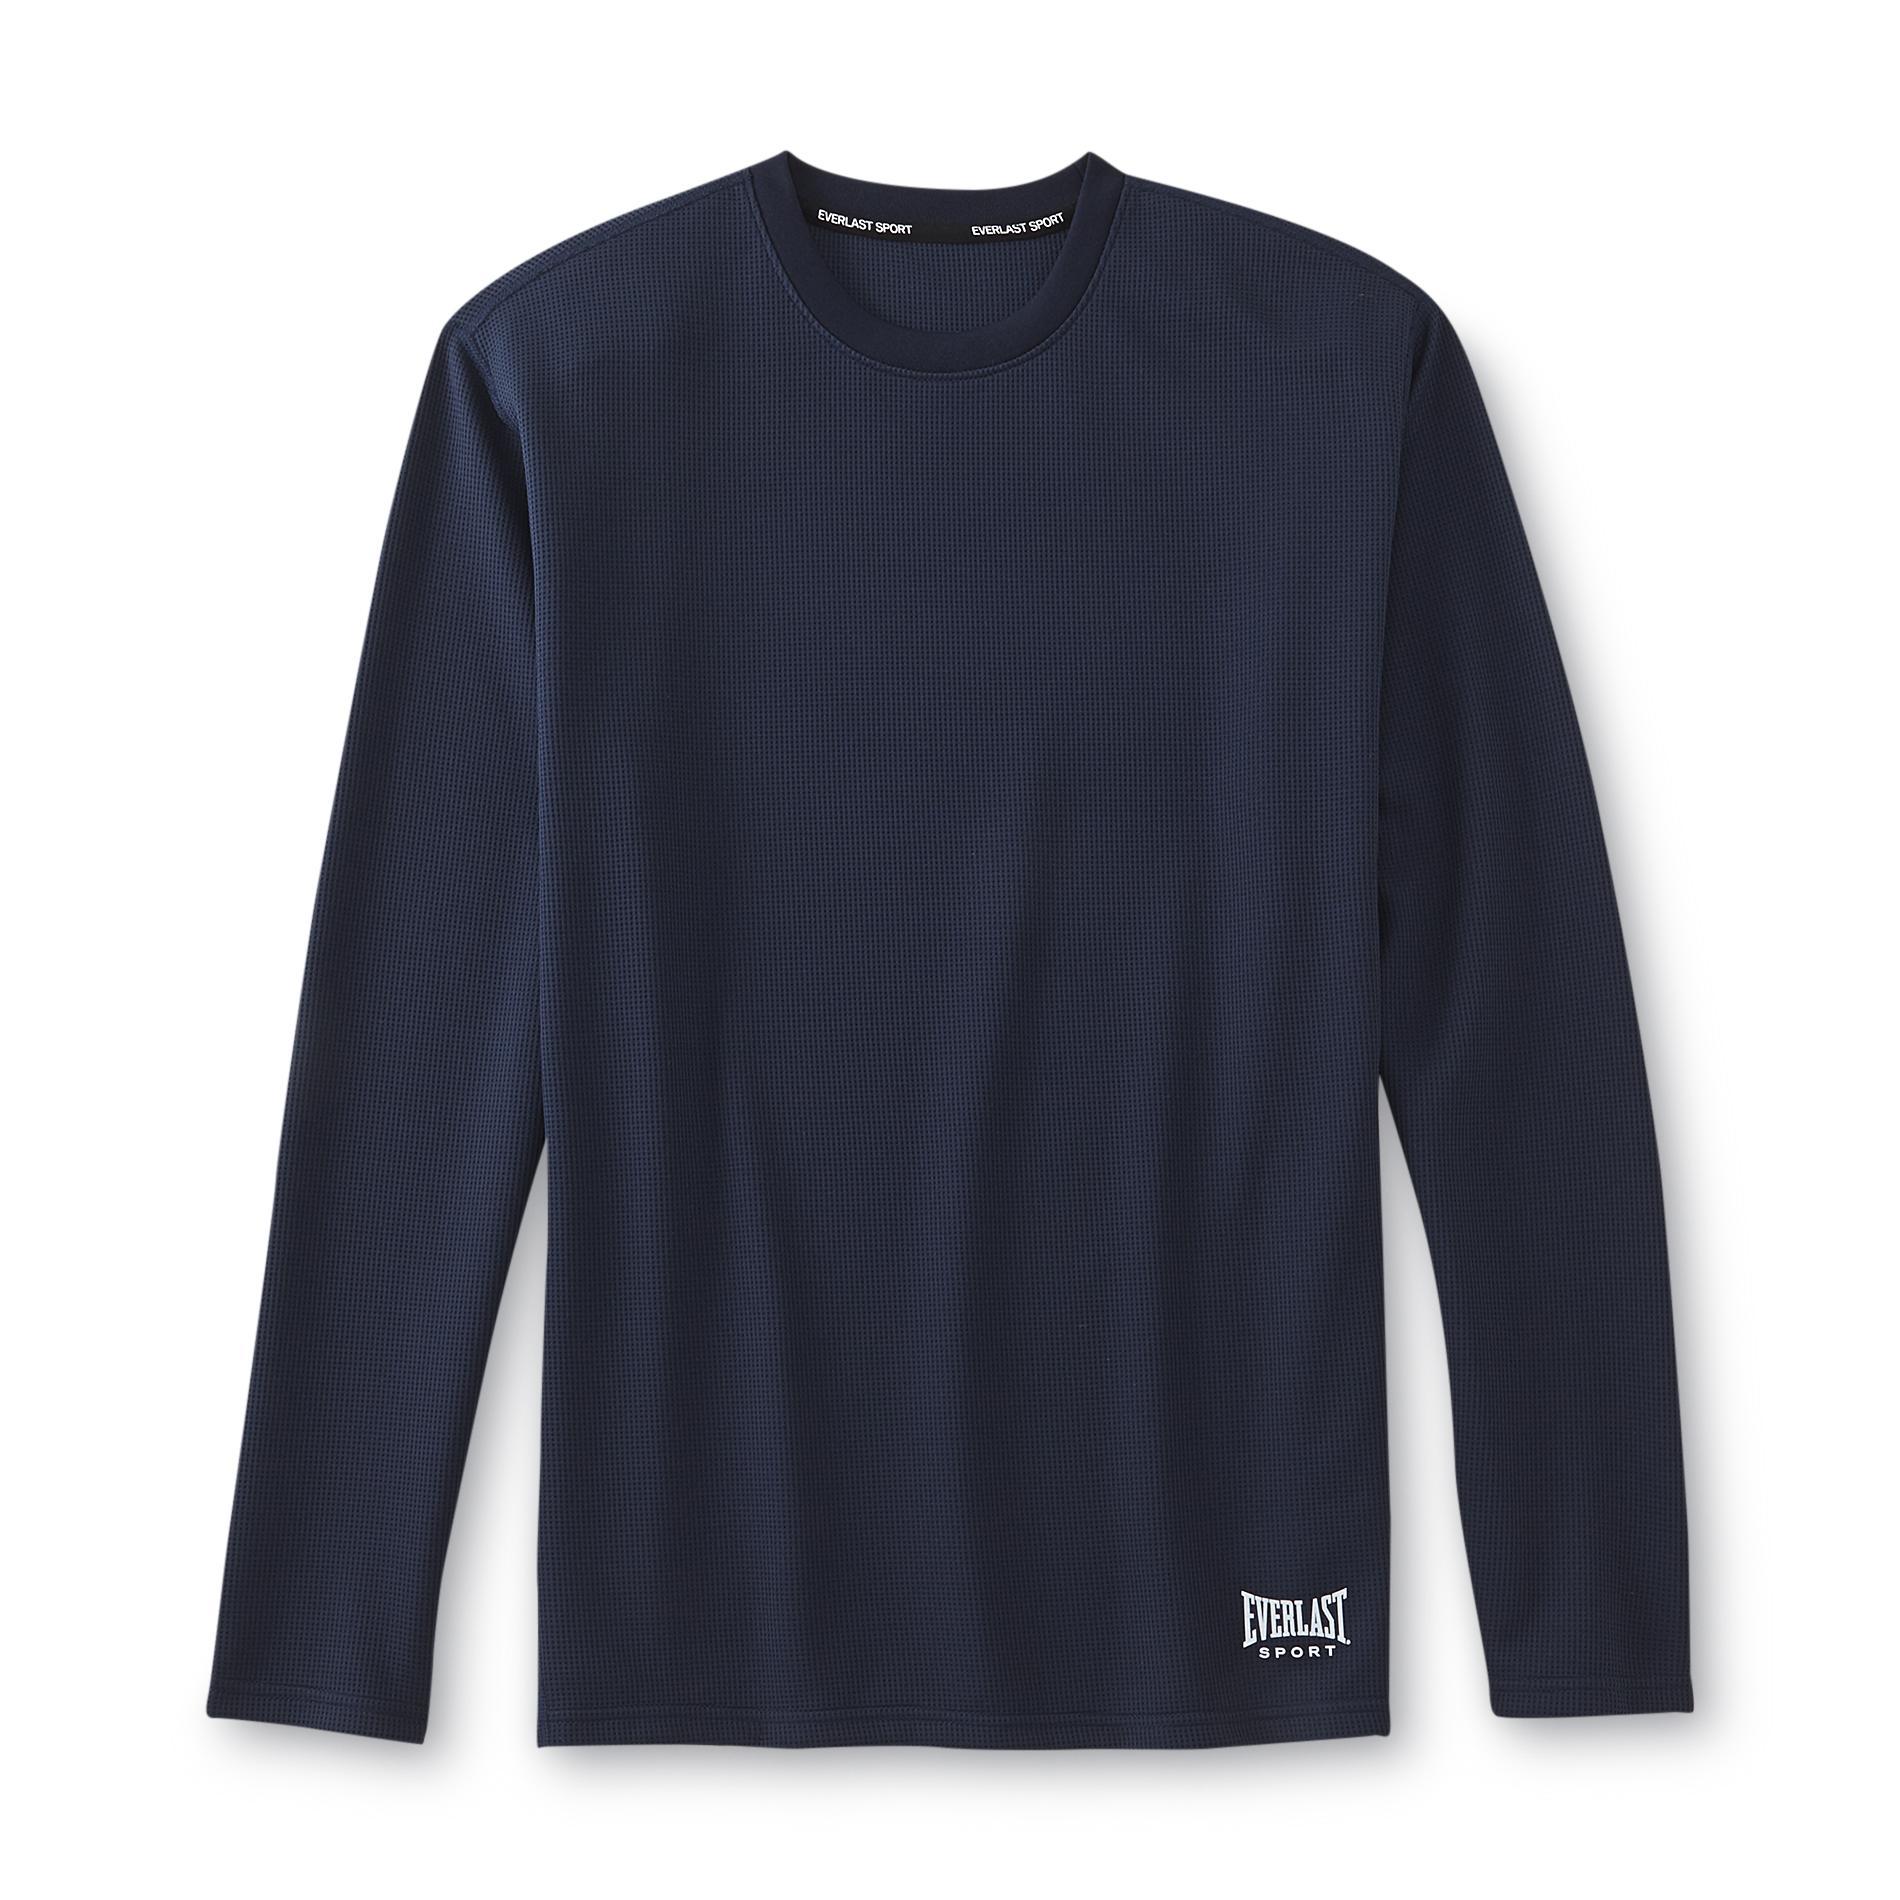 Everlast® Sport Men's Long-Sleeve Thermal Performance Shirt